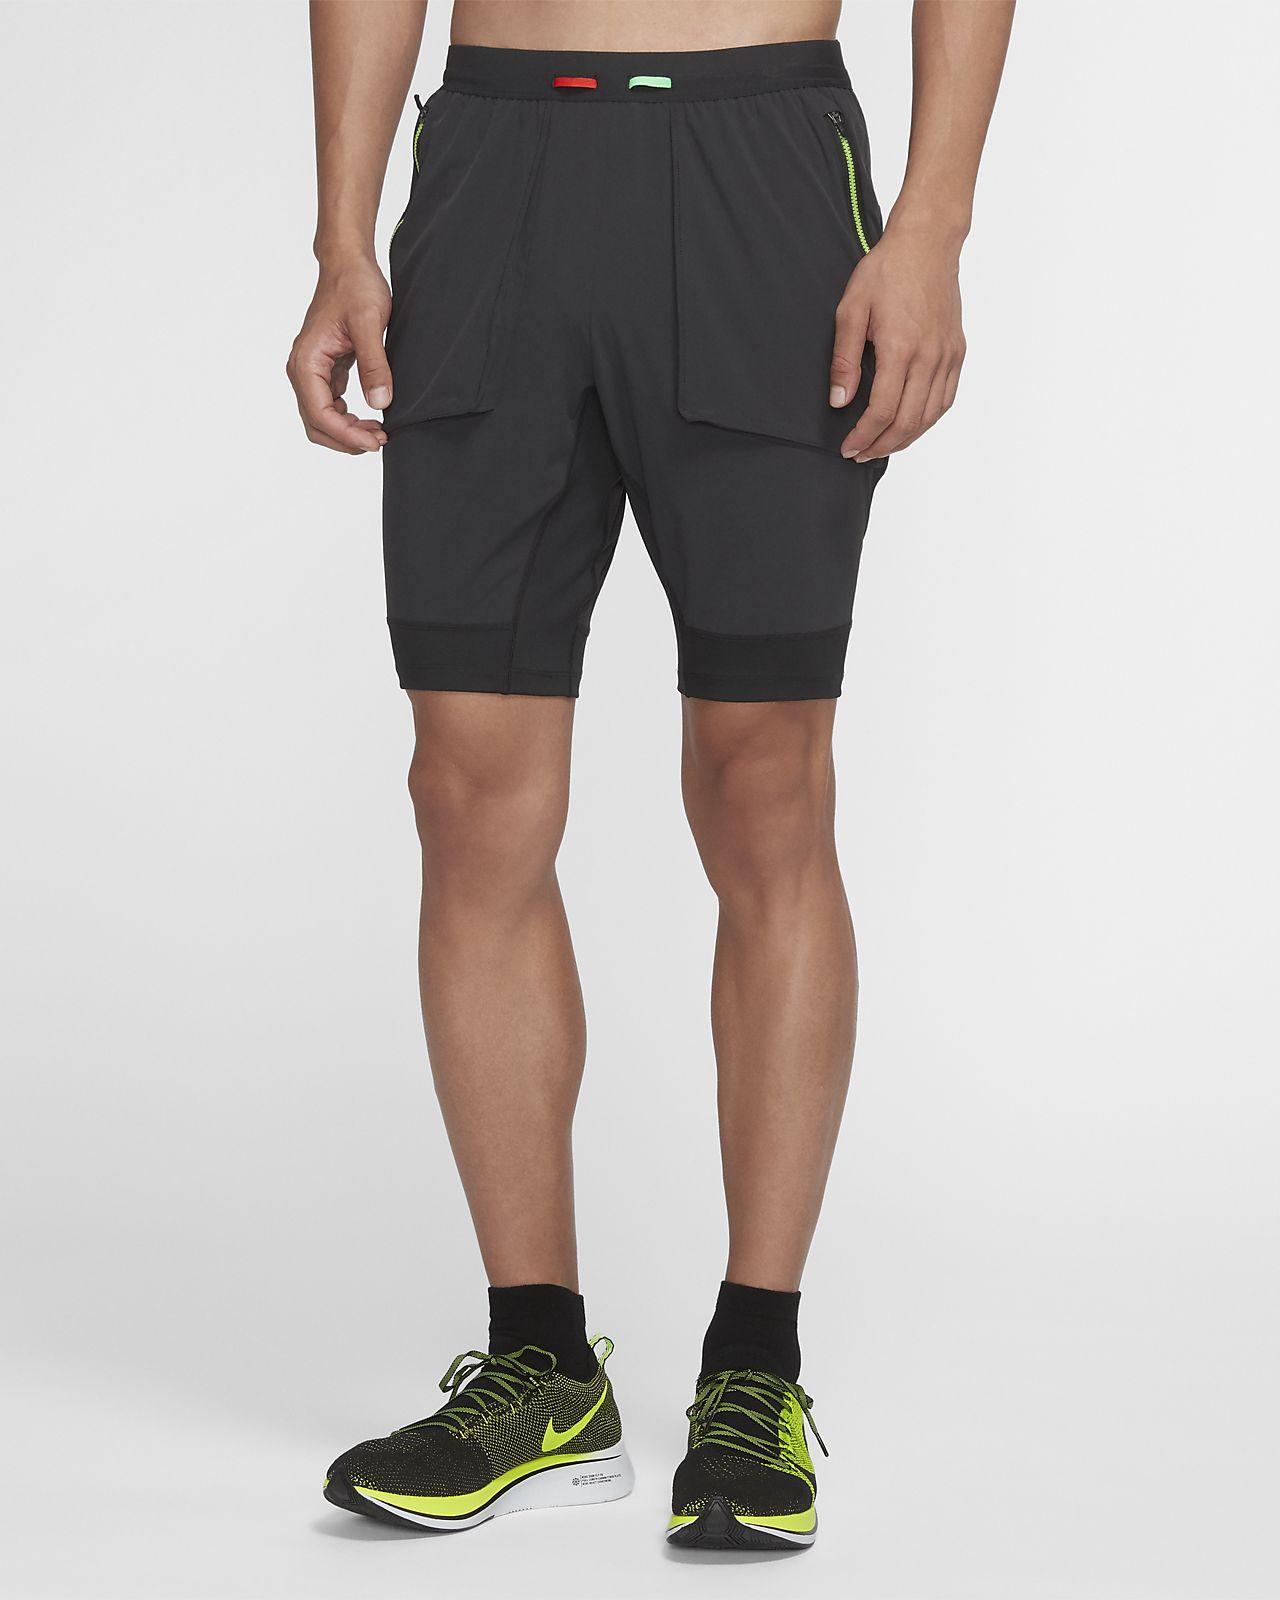 Nike 男款 Hybrid 跑步短褲